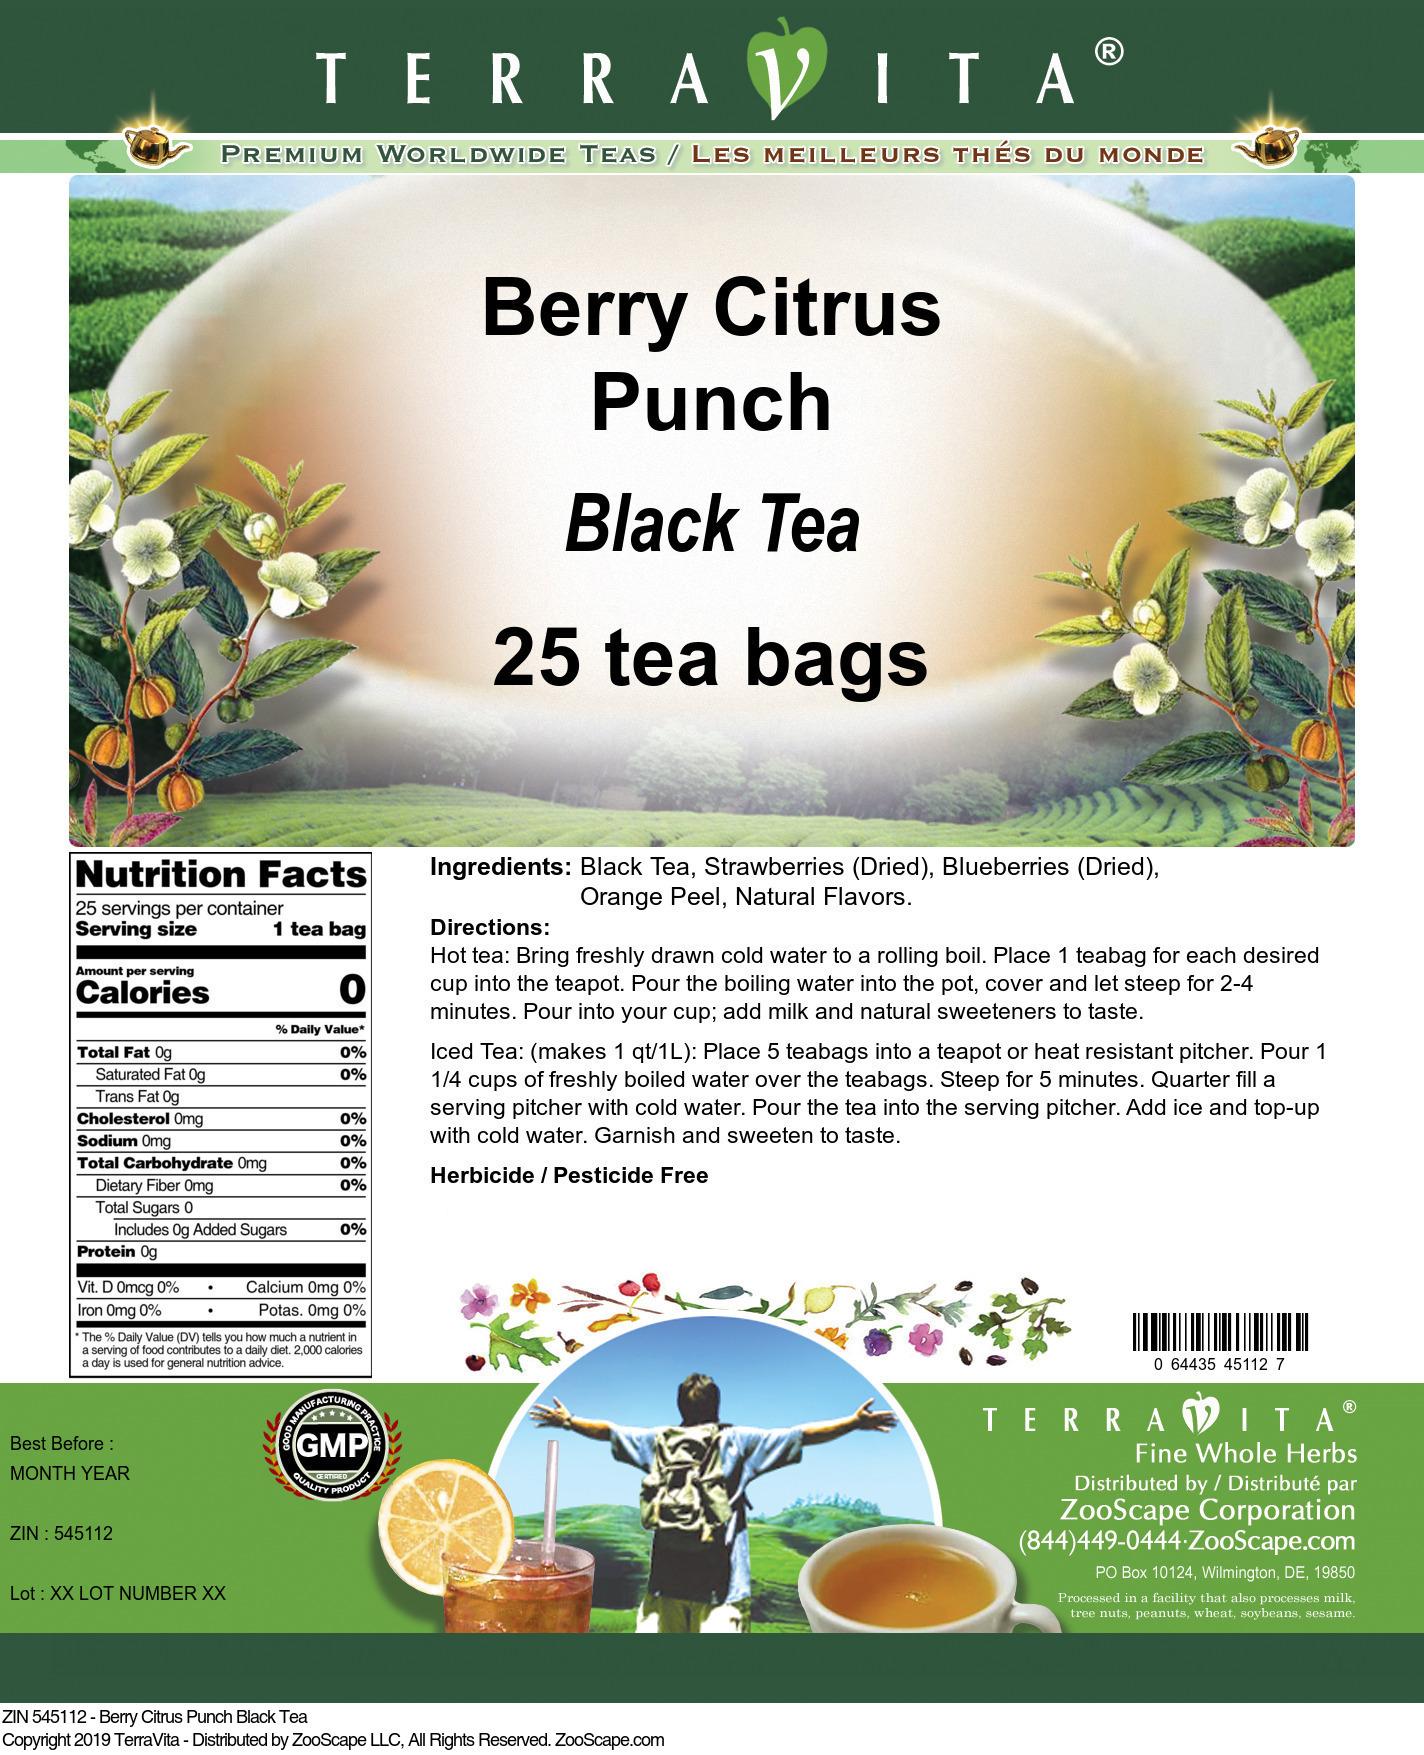 Berry Citrus Punch Black Tea